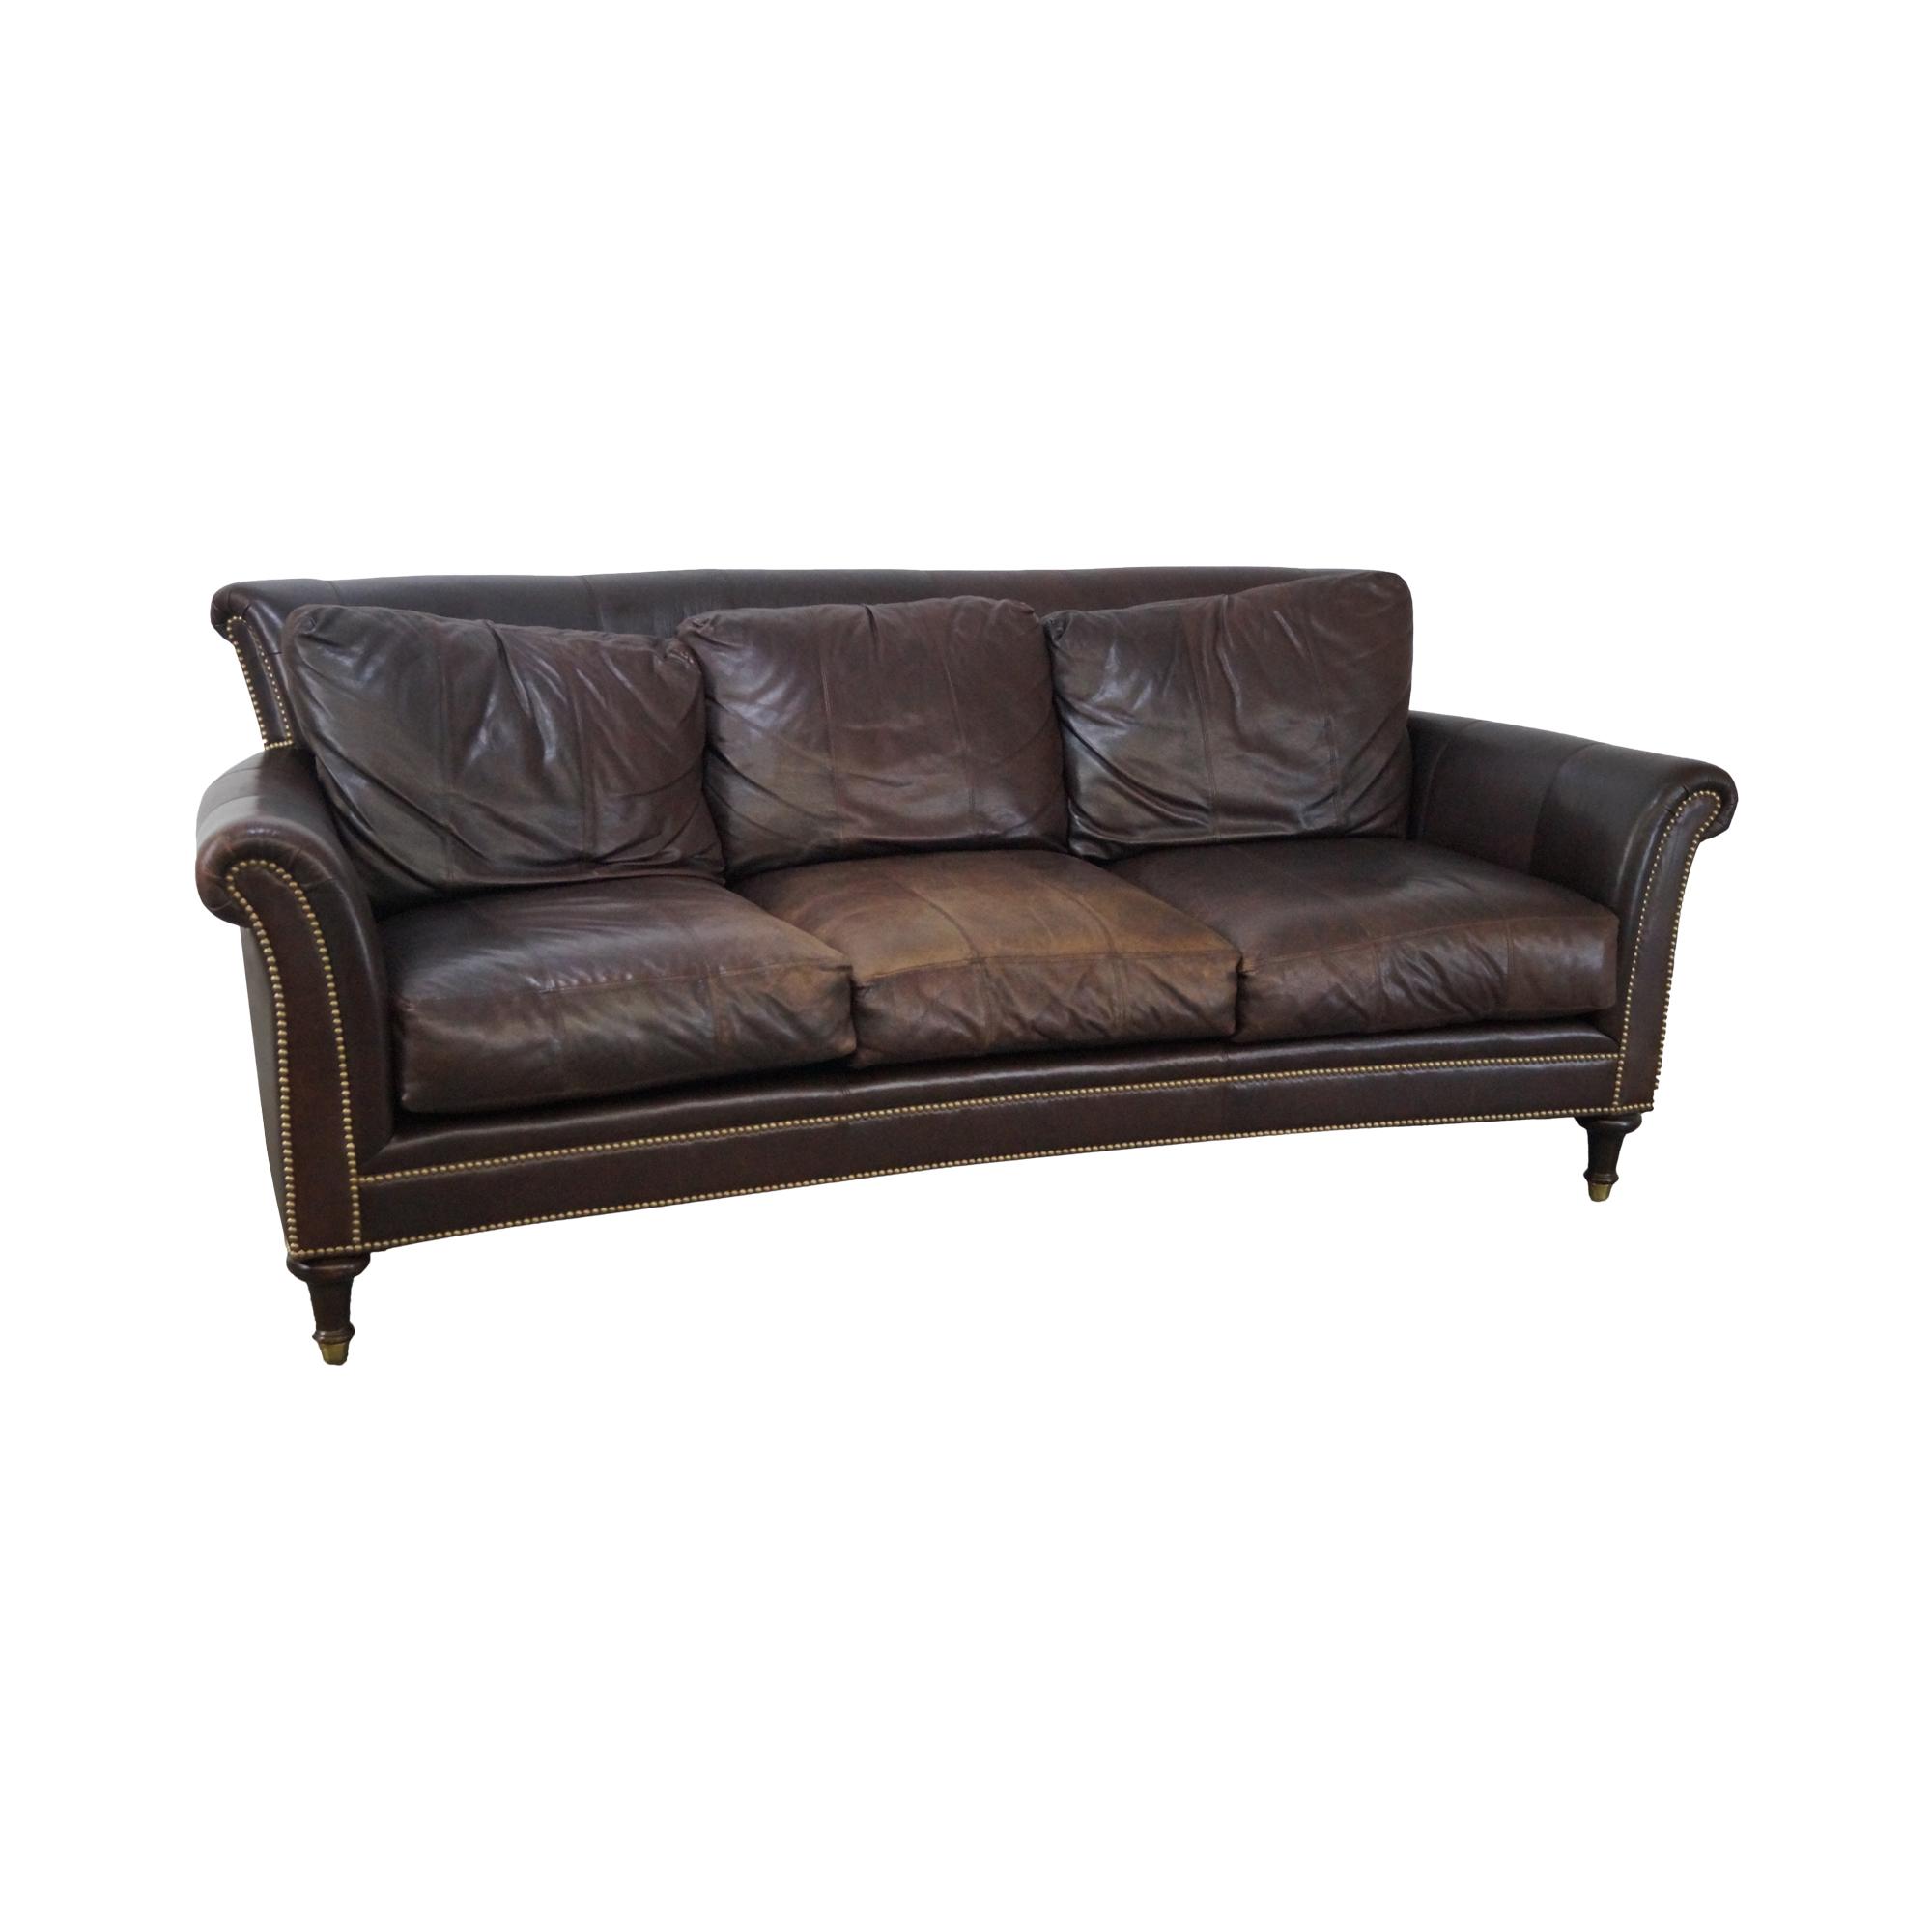 Ferguson Copeland Surrey Brown Leather Sofa Chairish